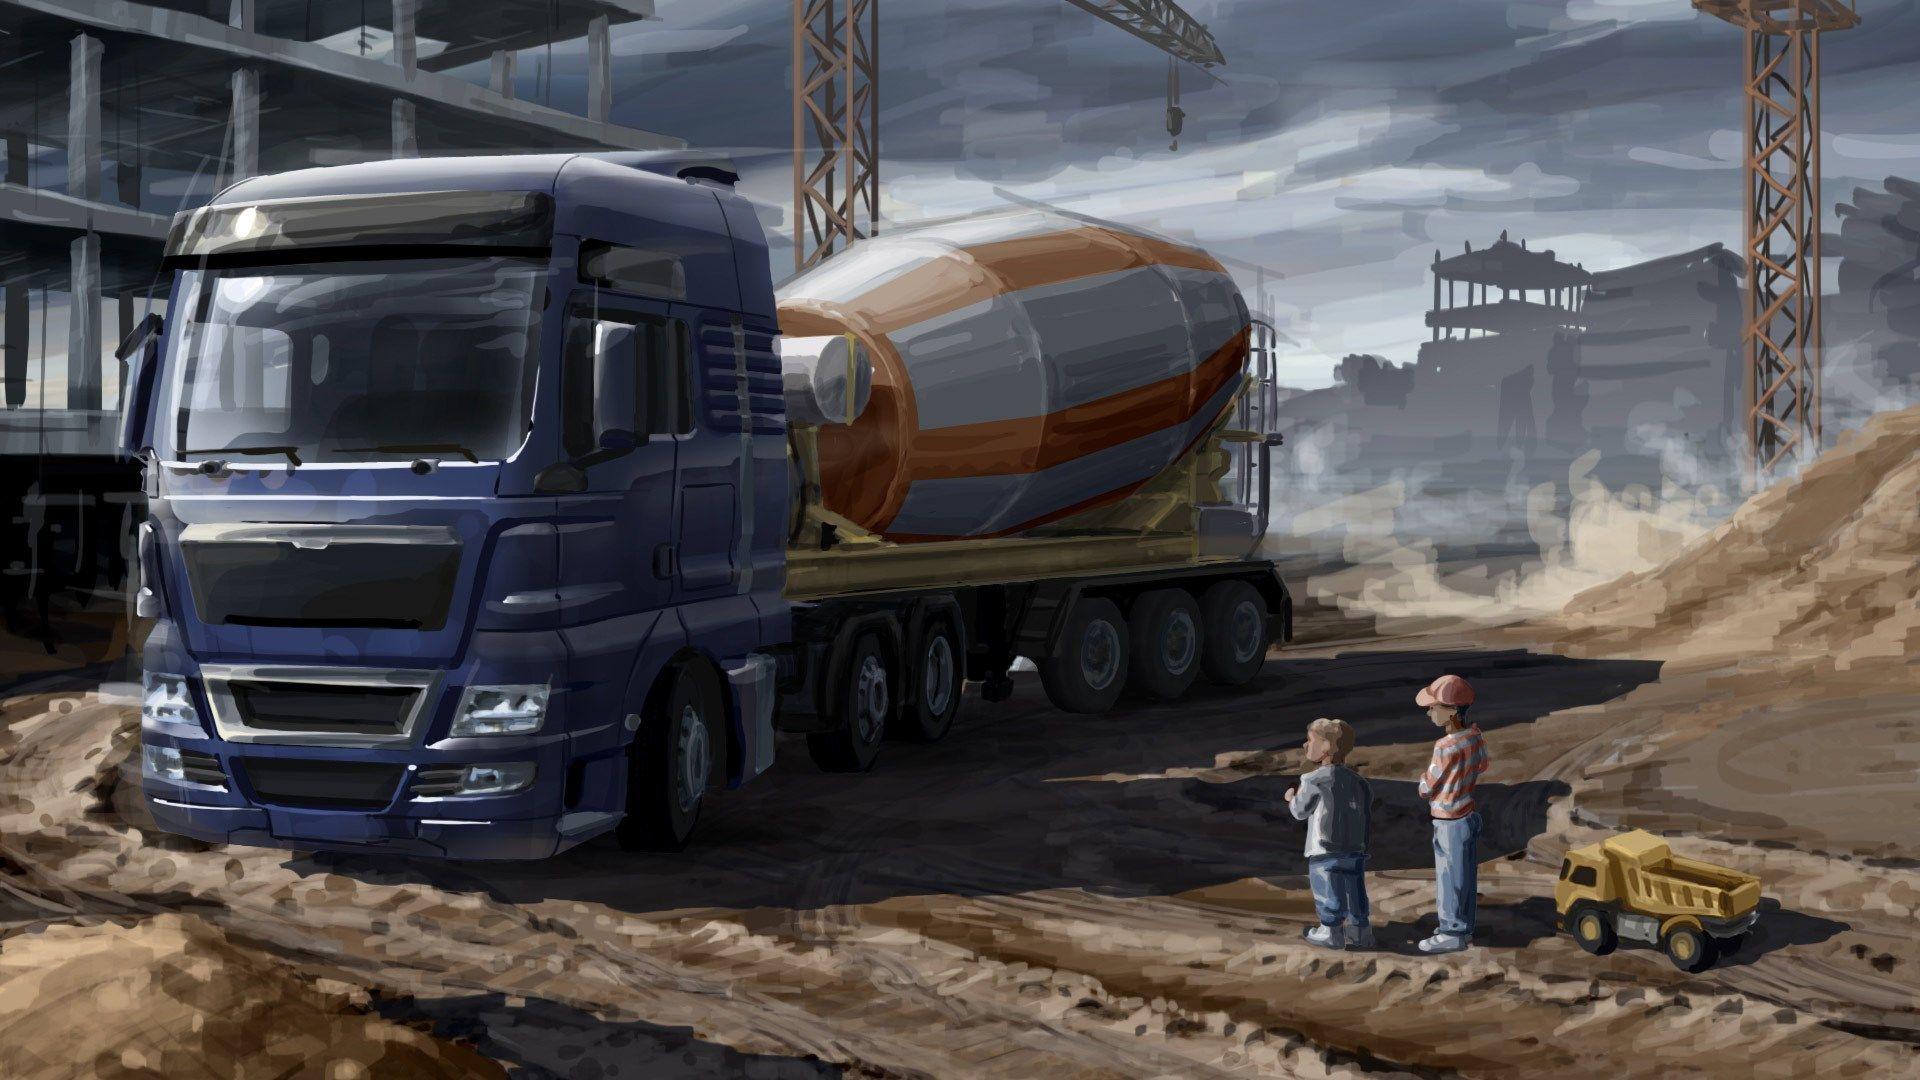 Images For Desktop Euro Truck Simulator 2 Wallpaper 311 Kb Halbert Birds Kamyonetler Oyunlar Euro